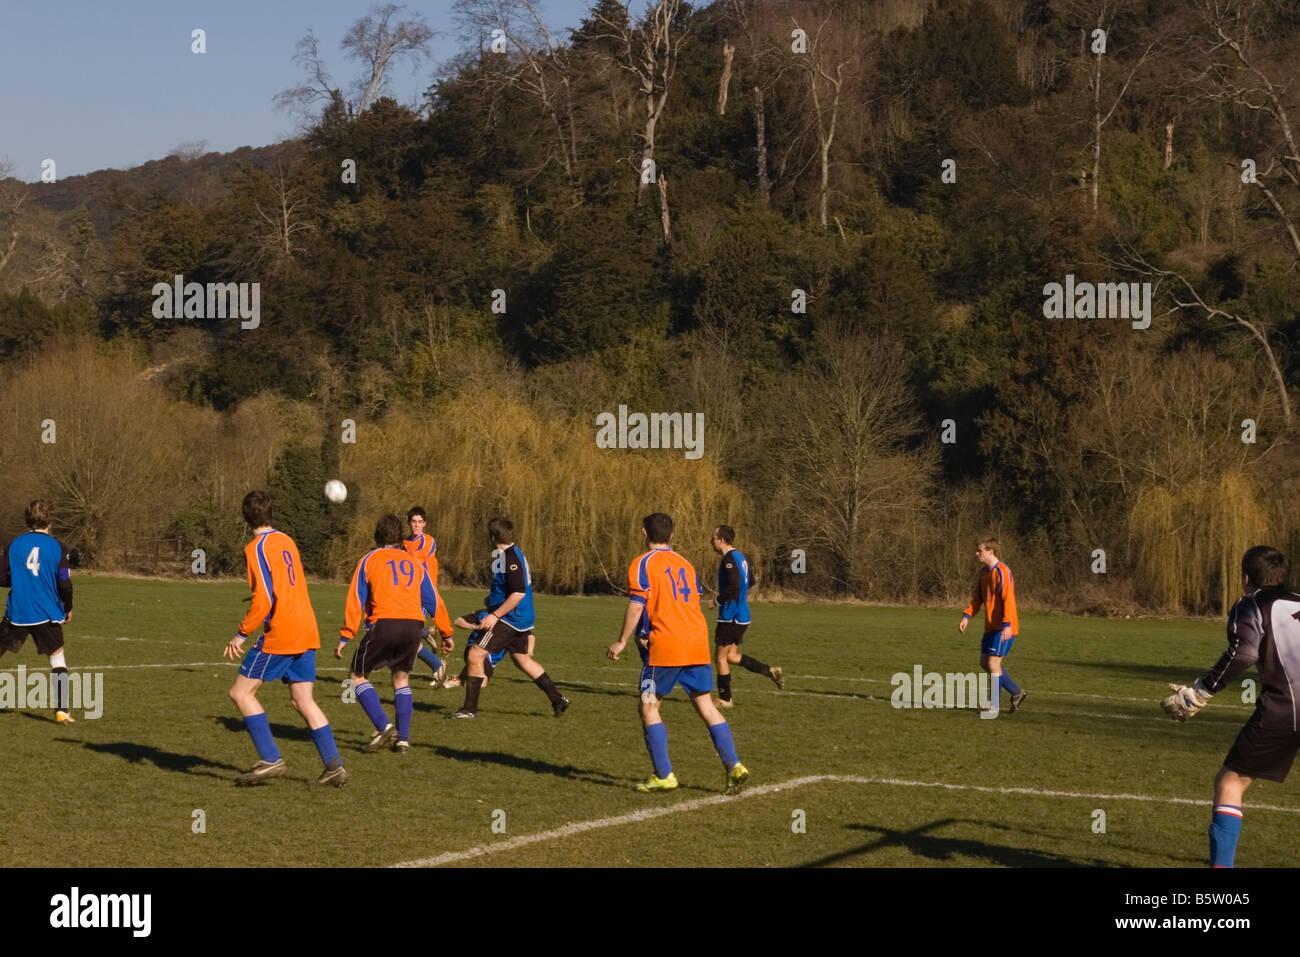 Amateur sunday league football Match - Stock Image